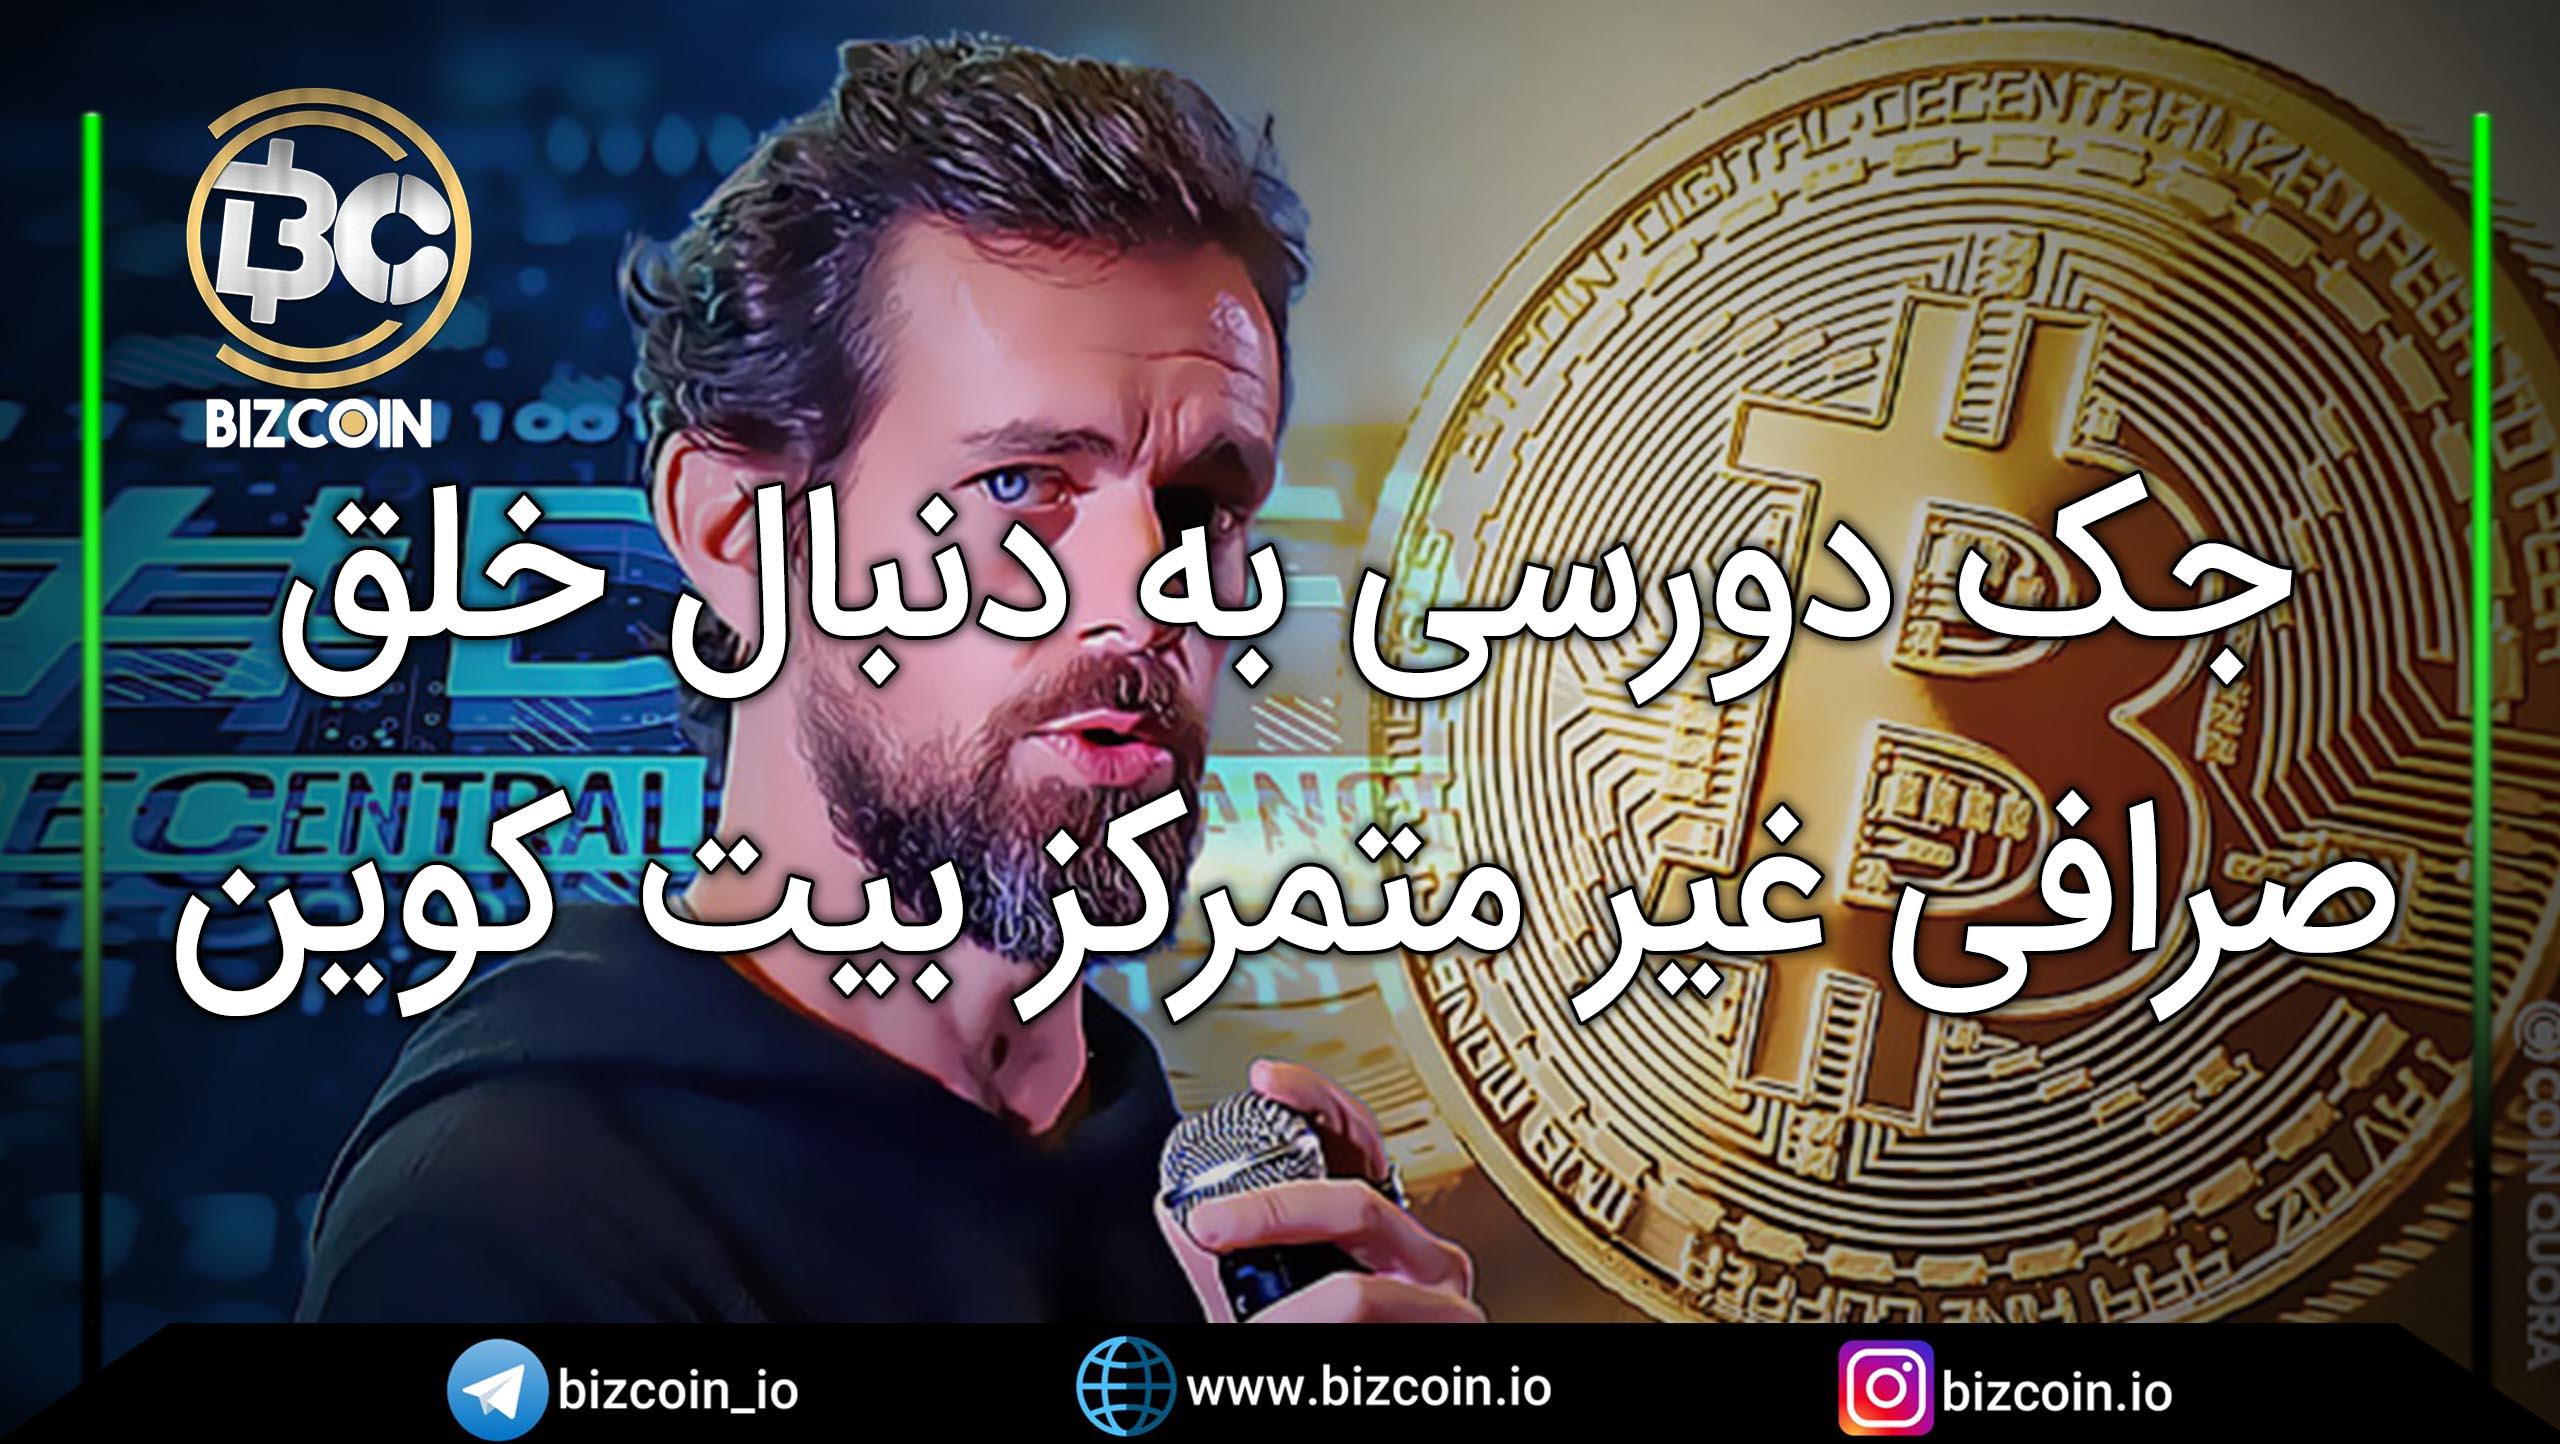 Jack Dorsey seeks to create a decentralized bitcoin exchange جک دورسی به دنبال خلق صرافی غیر متمرکز بیت کوین